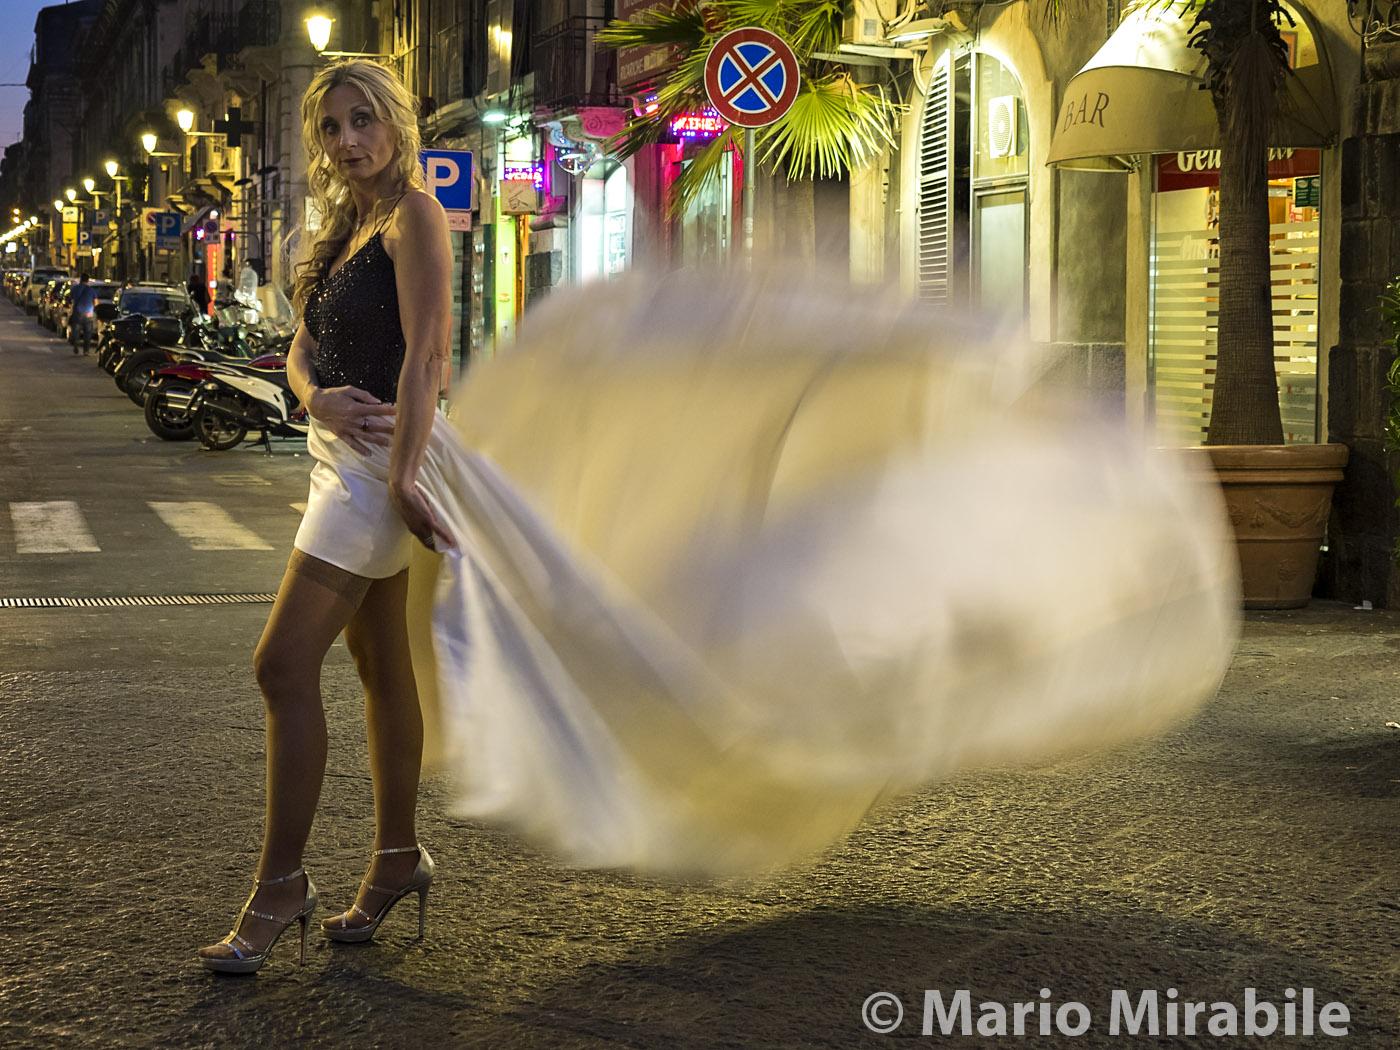 20160602 Messina-Catania (125) copy.jpg